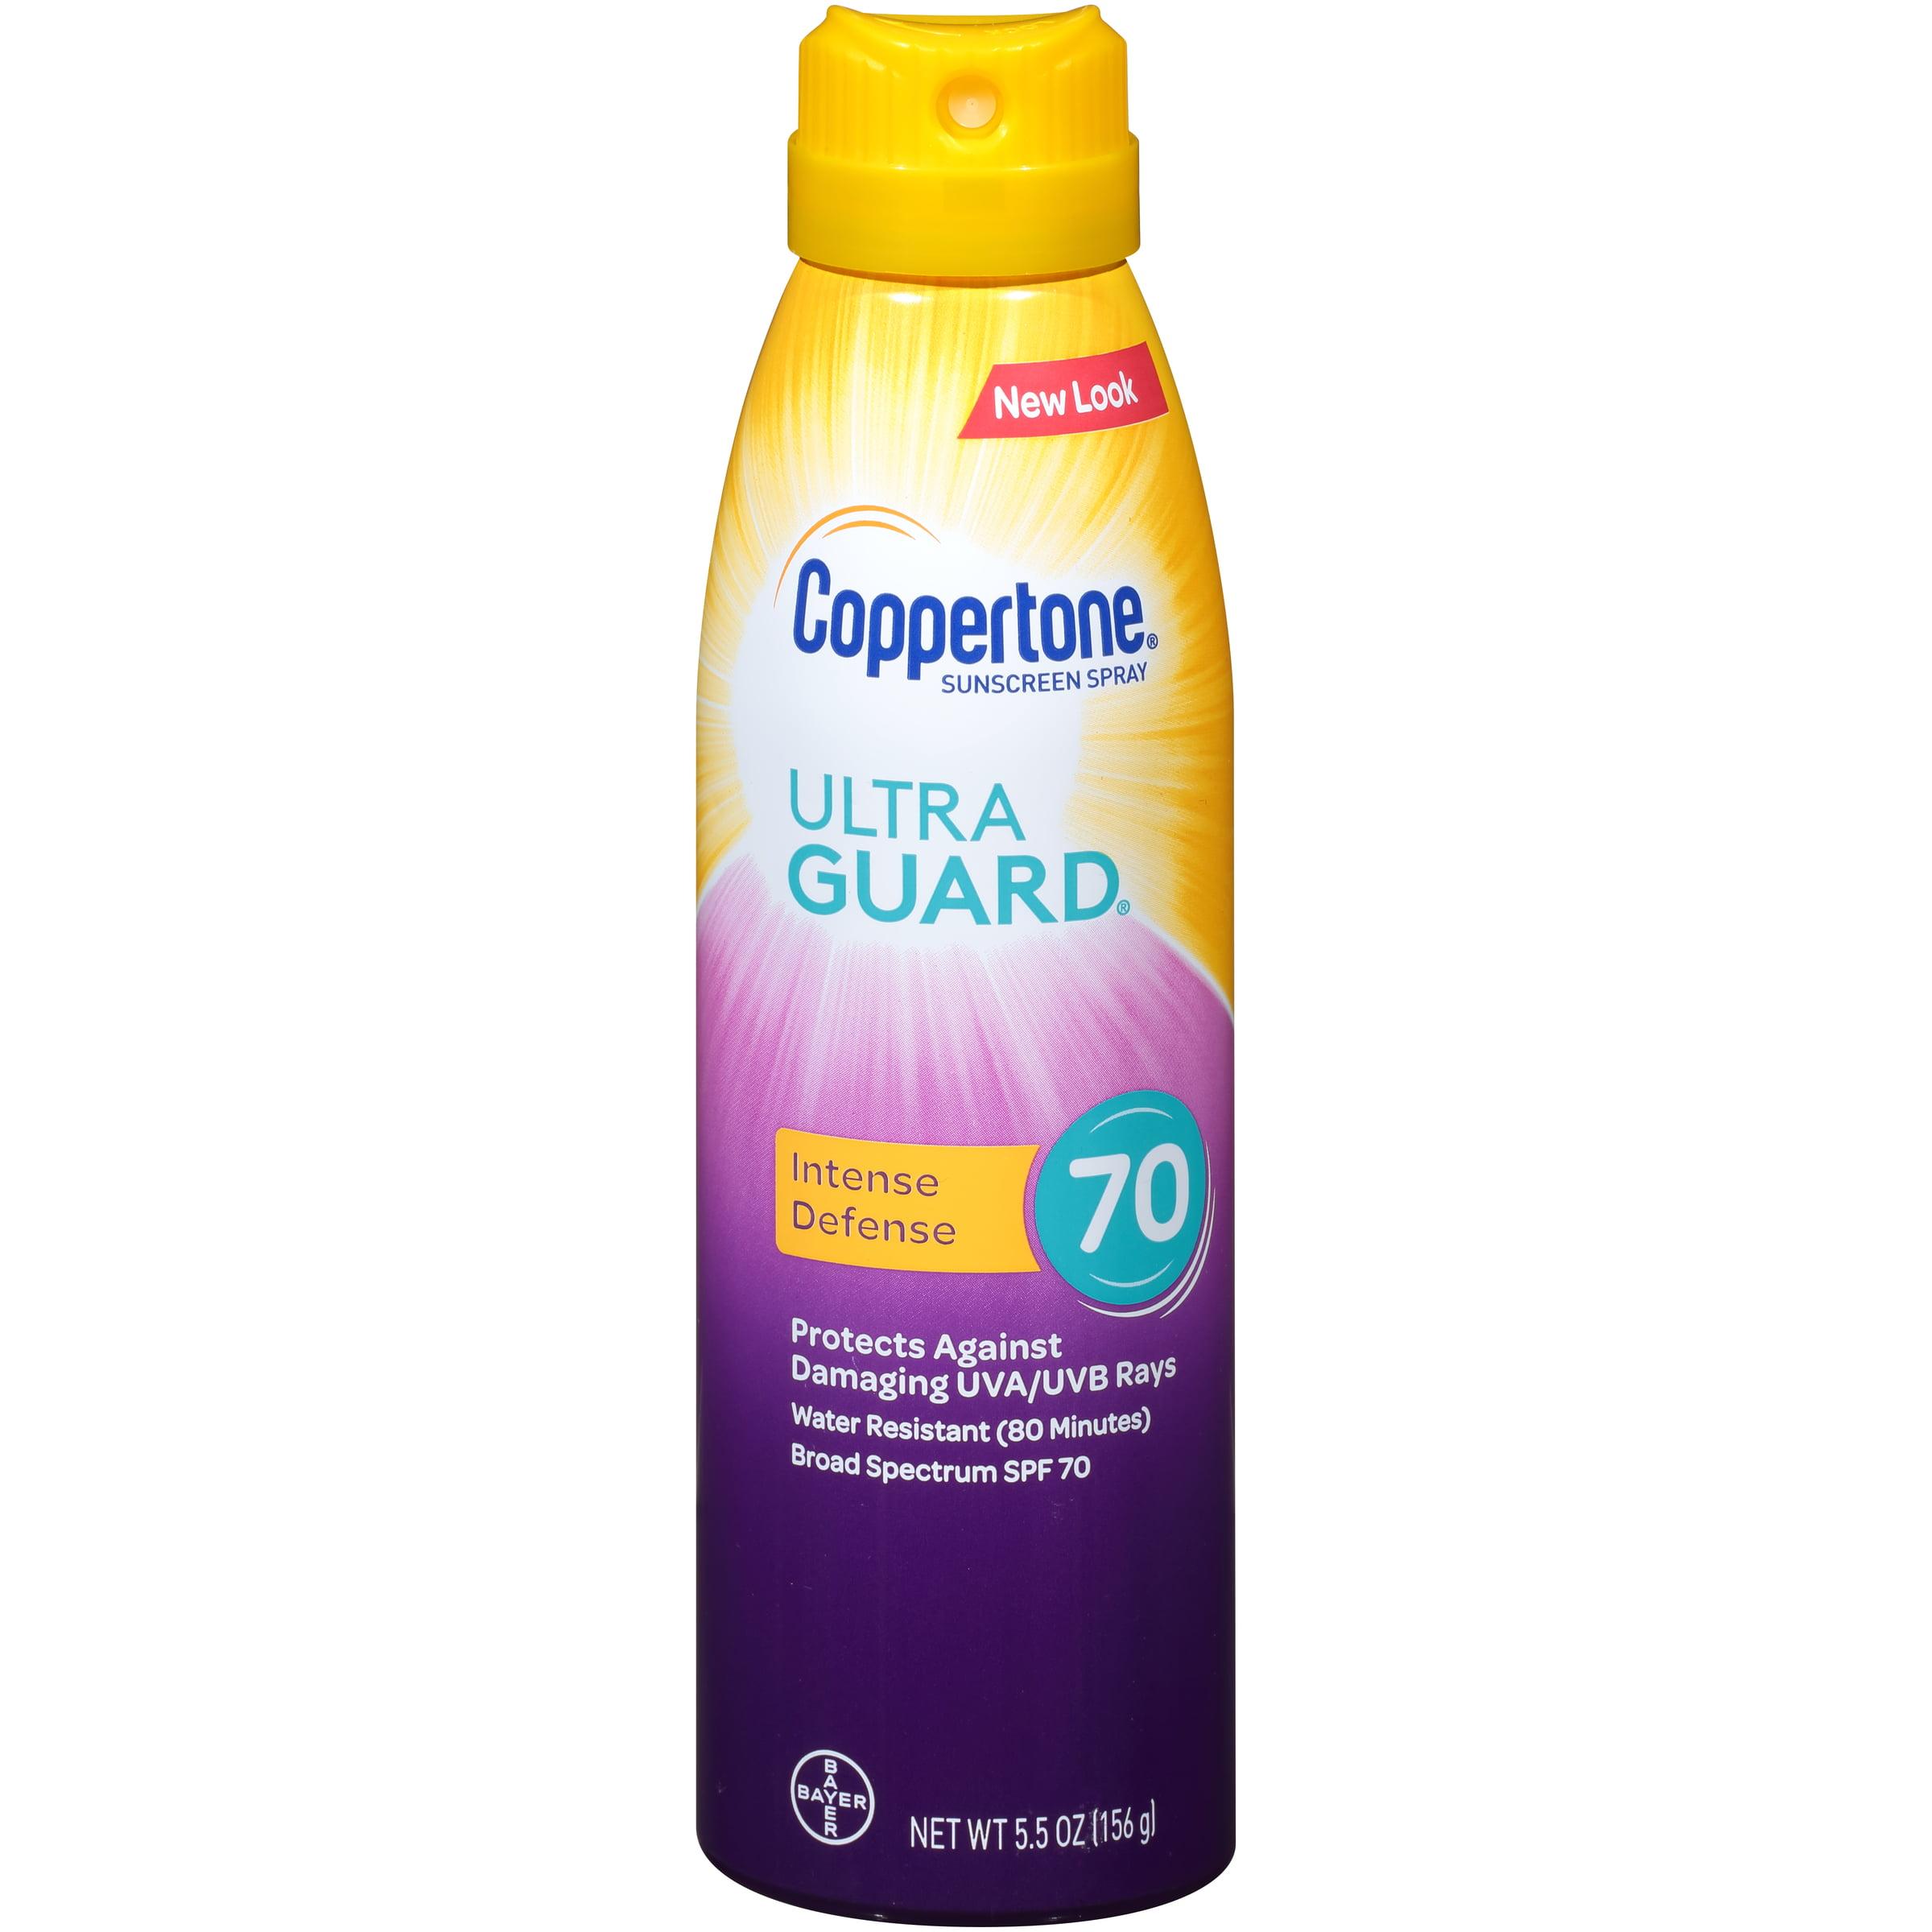 Coppertone Ultra Guard Sunscreen Continuous Spray SPF 70, 5.5 oz